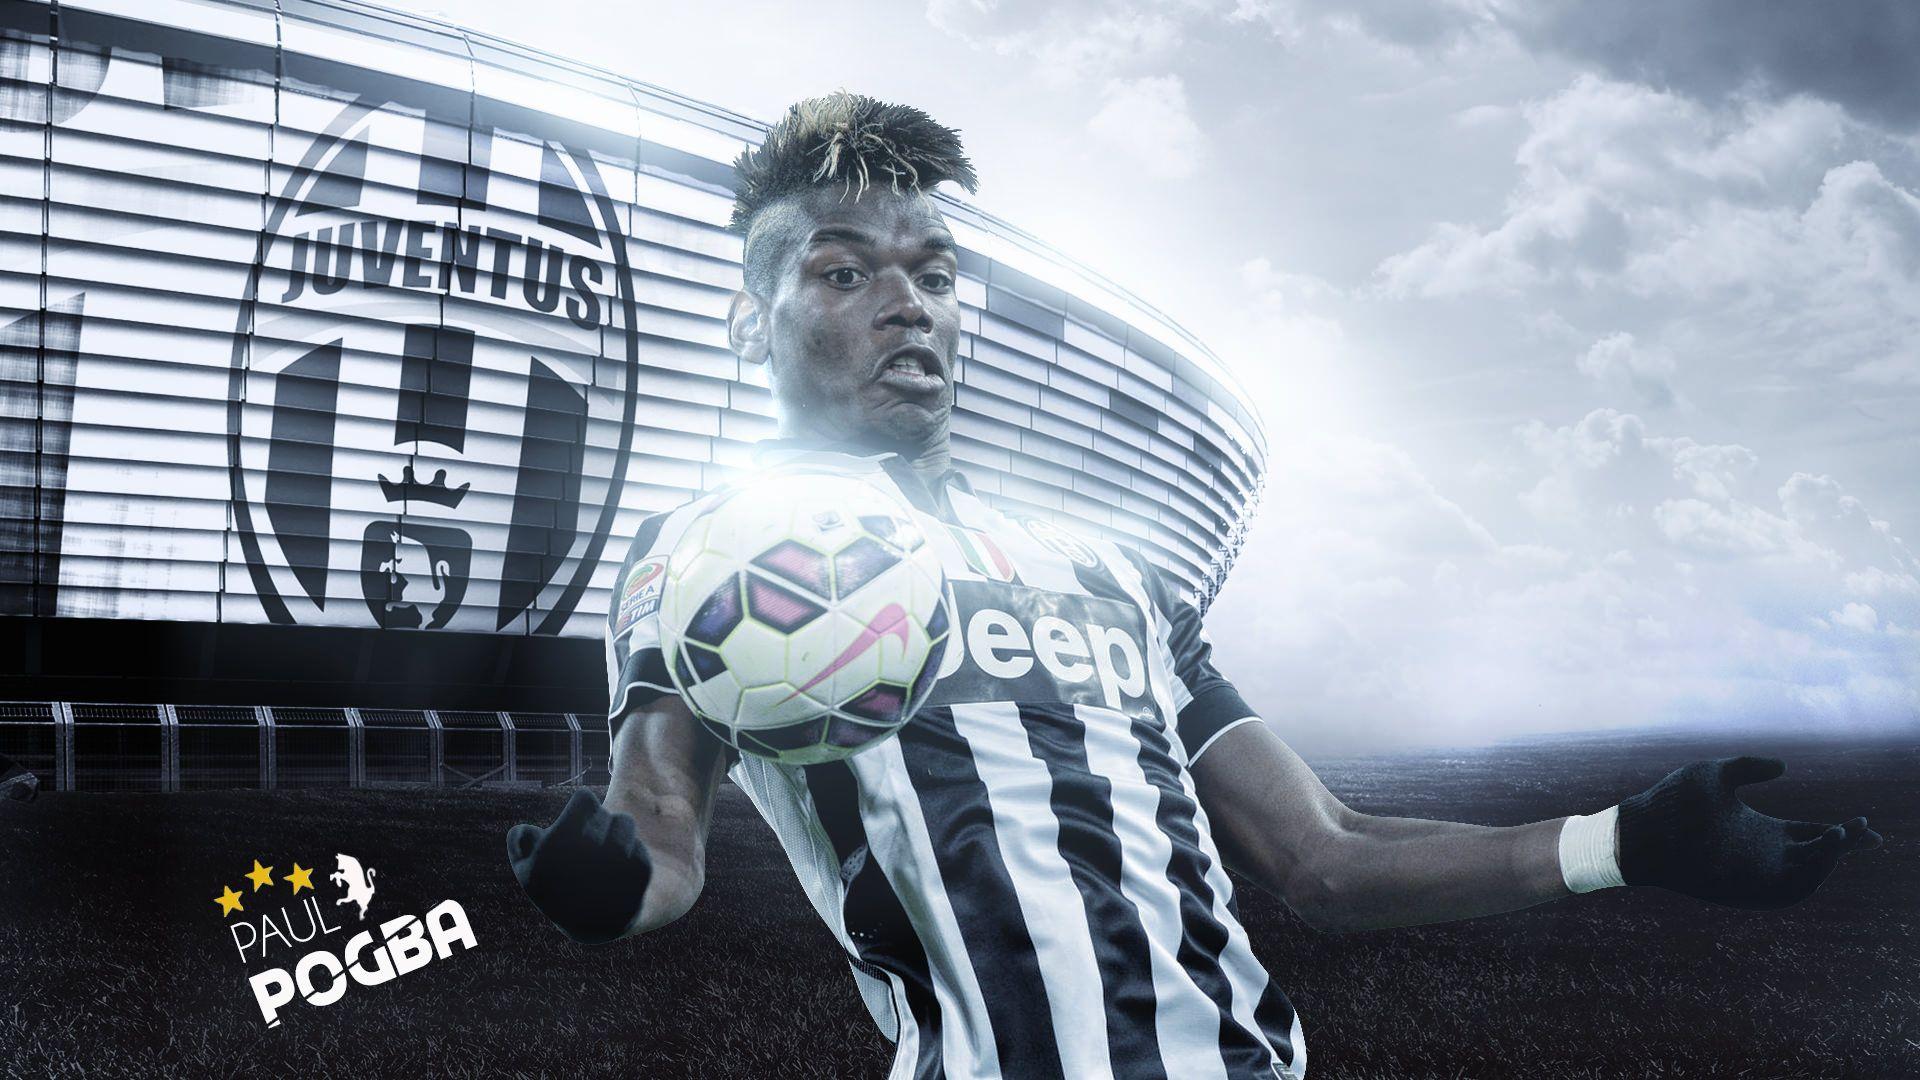 Paul Pogba Juventus 2015/2016 Wallpaper